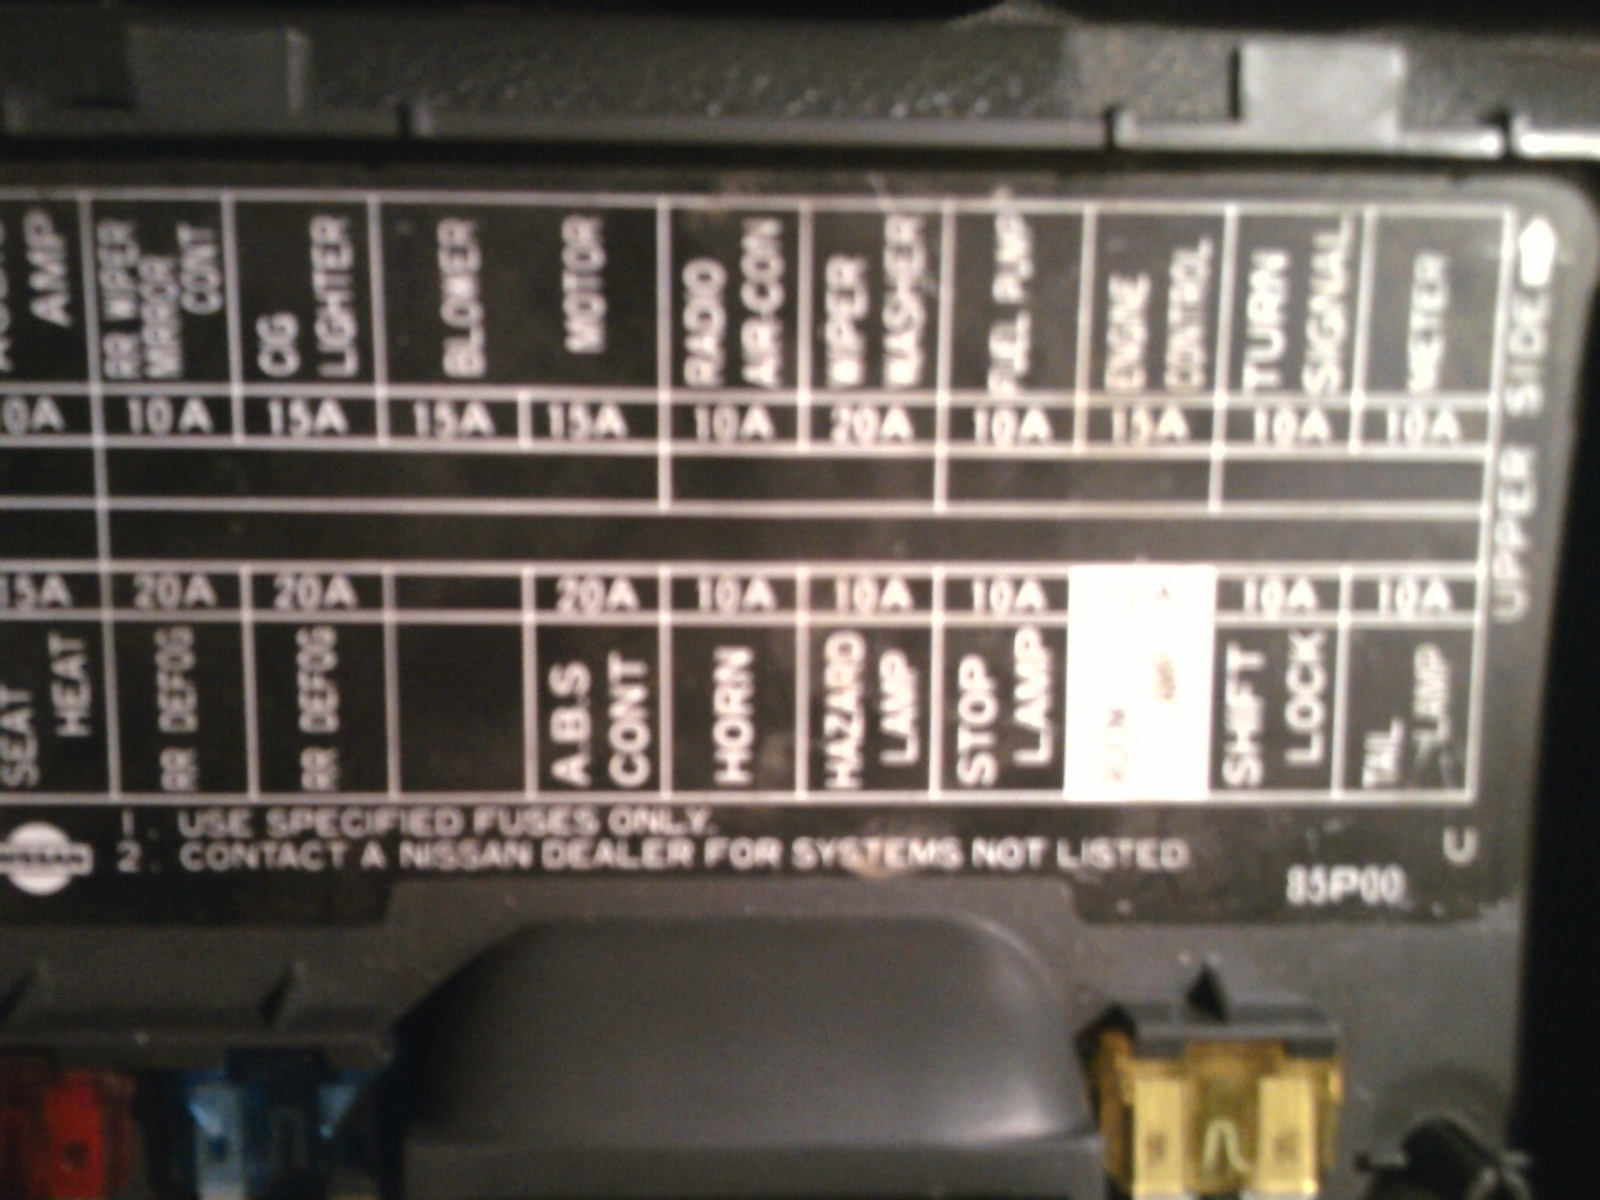 Enjoyable Nissan Hardbody Fuse Box Wiring Diagram Wiring Cloud Ittabisraaidewilluminateatxorg